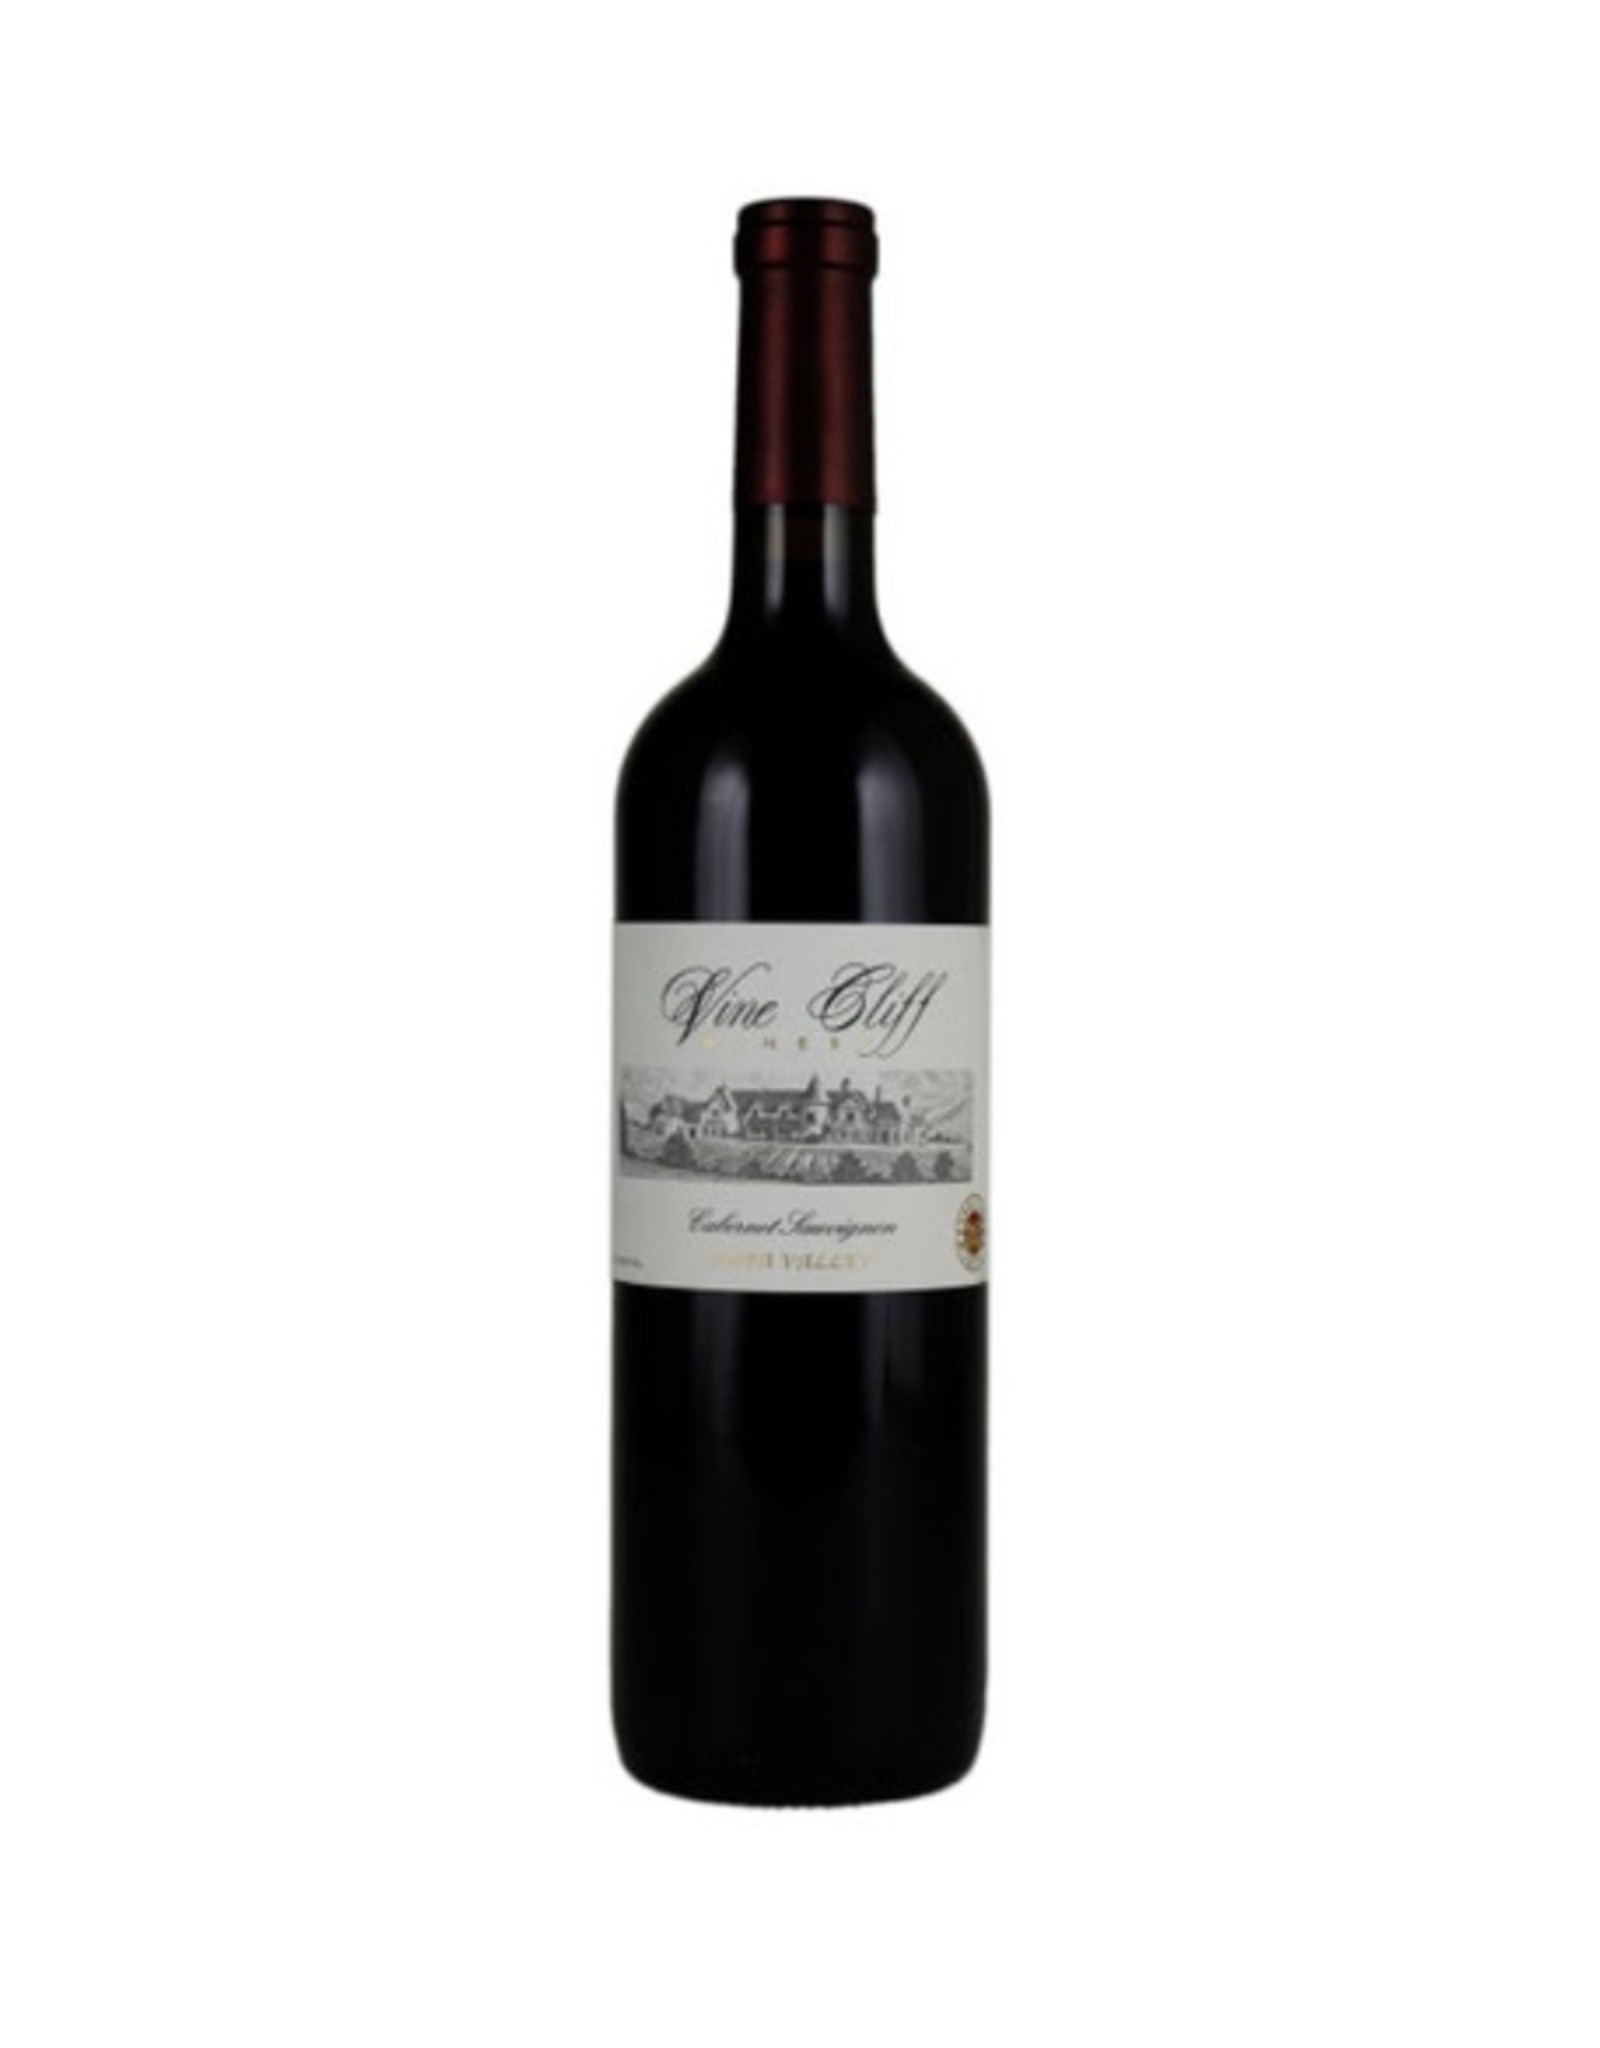 Vine Cliff Cabernet Sauvignon OAKVILLE 2014